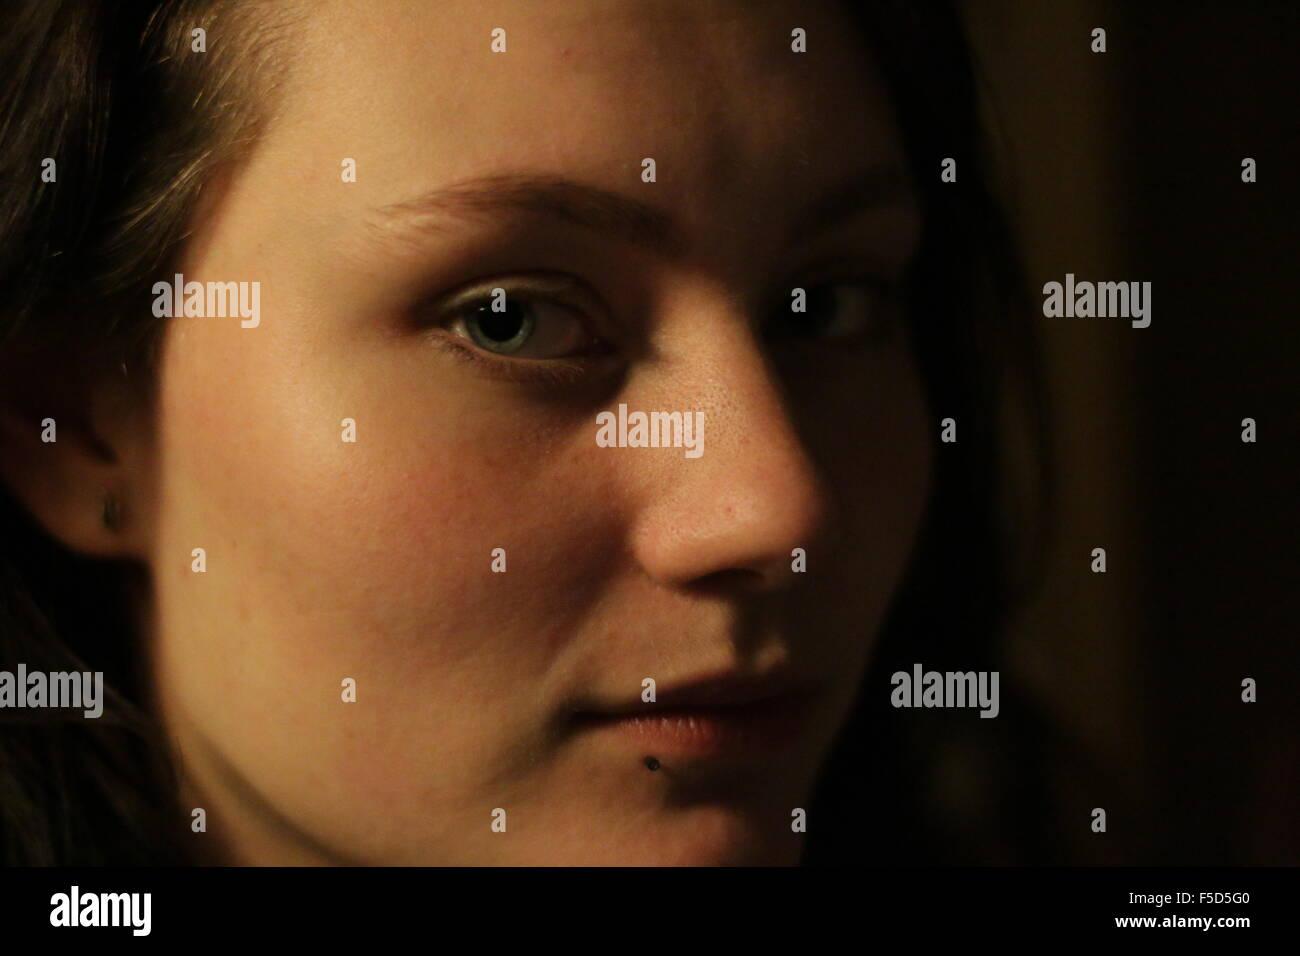 portrait-of-girl-model-release-may-be-pr